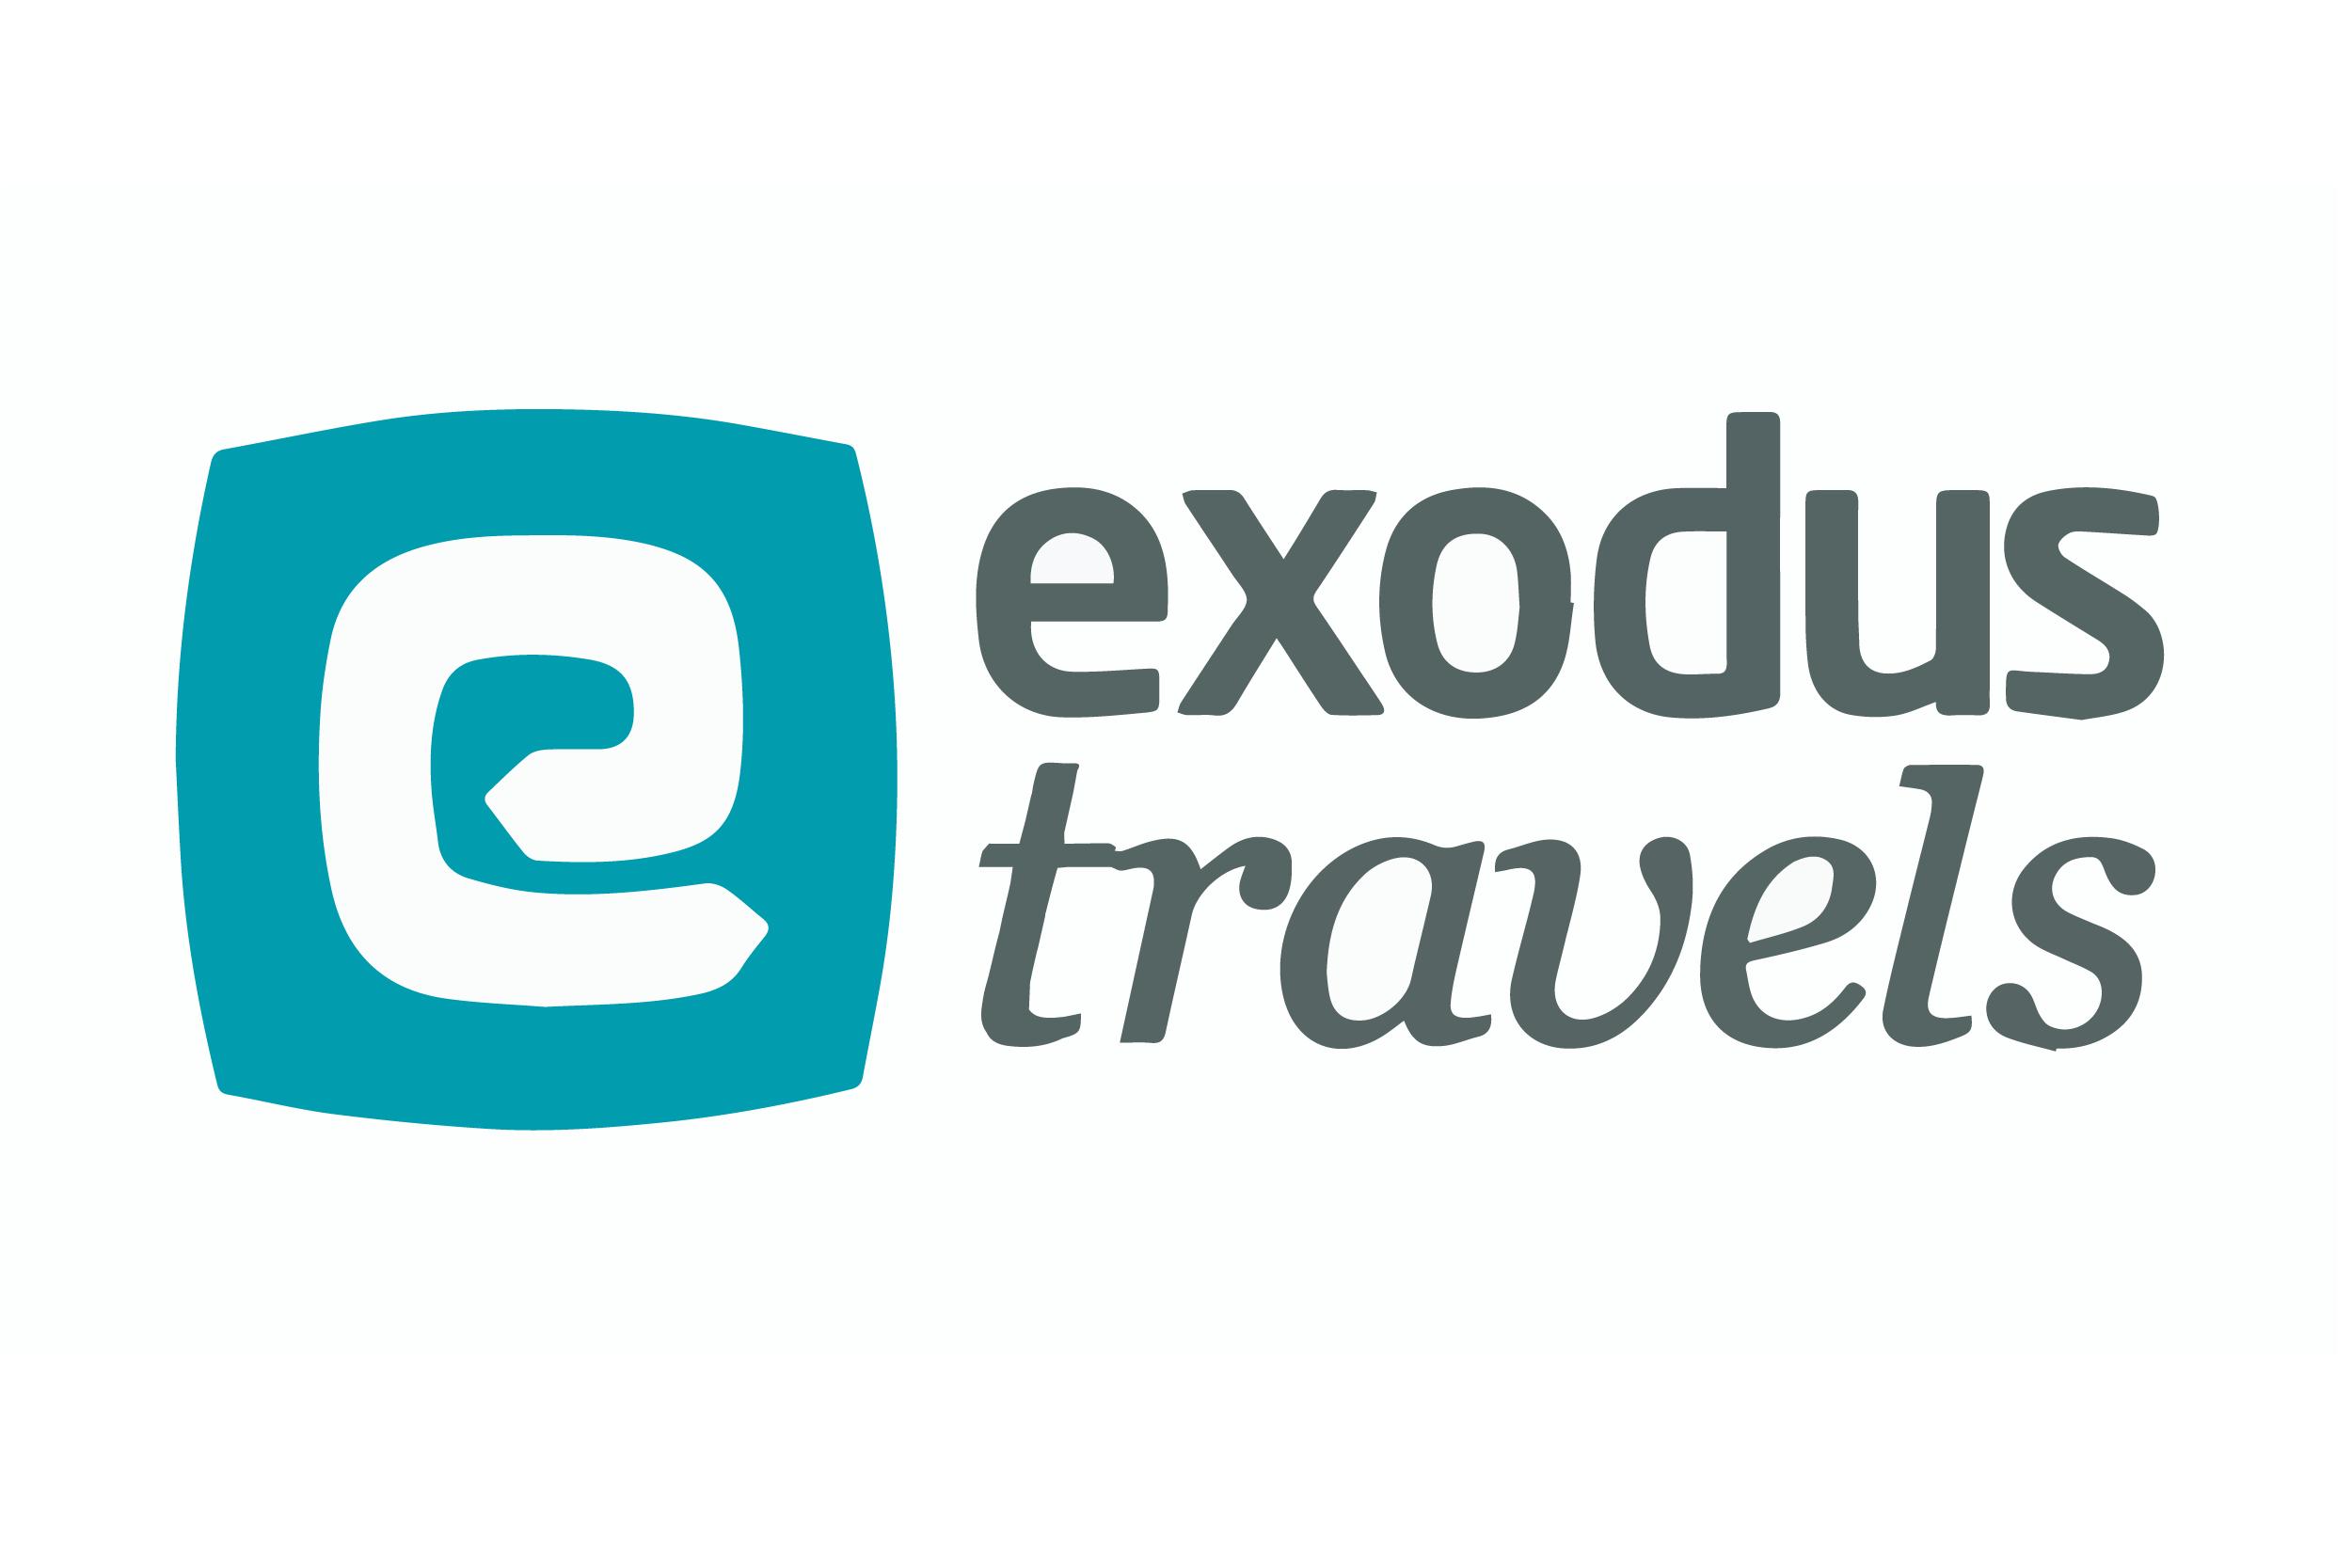 Exodustravel600*400-01